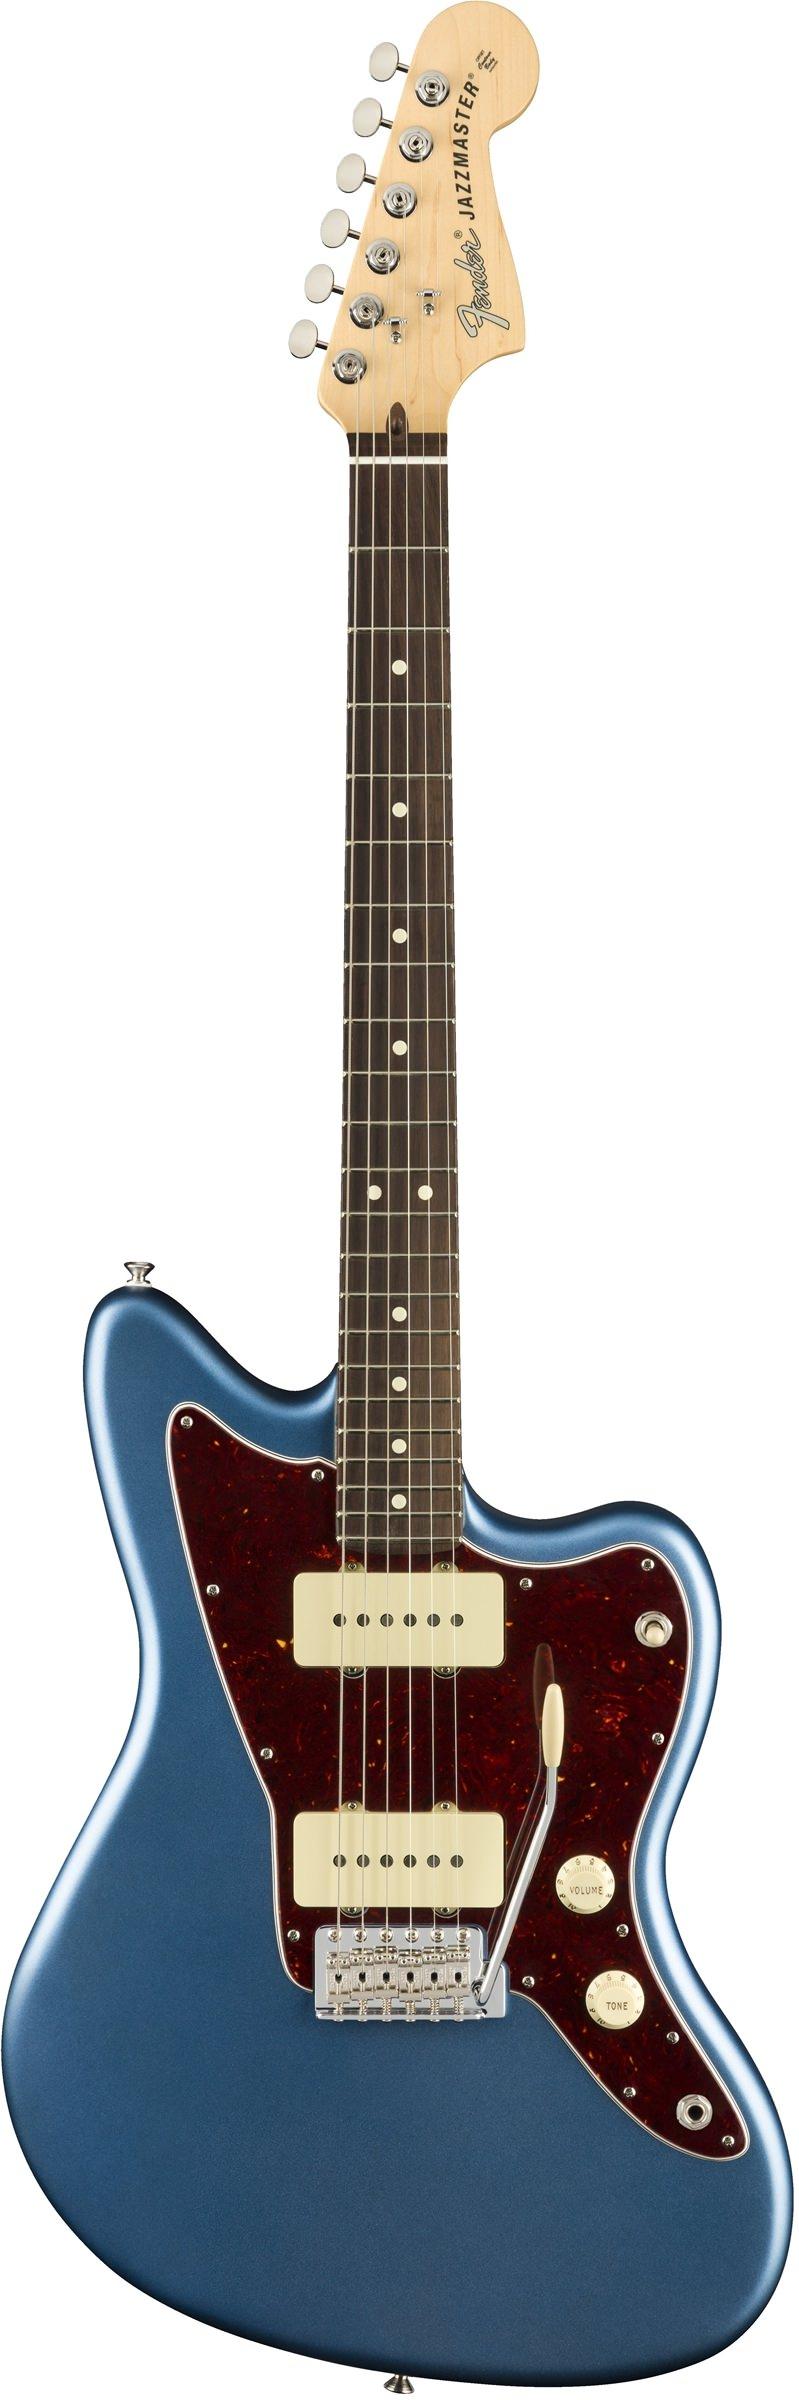 Электрогитара Fender American Performer Jazzmaster Rosewood Fingerboard Satine Lake Placid Blue